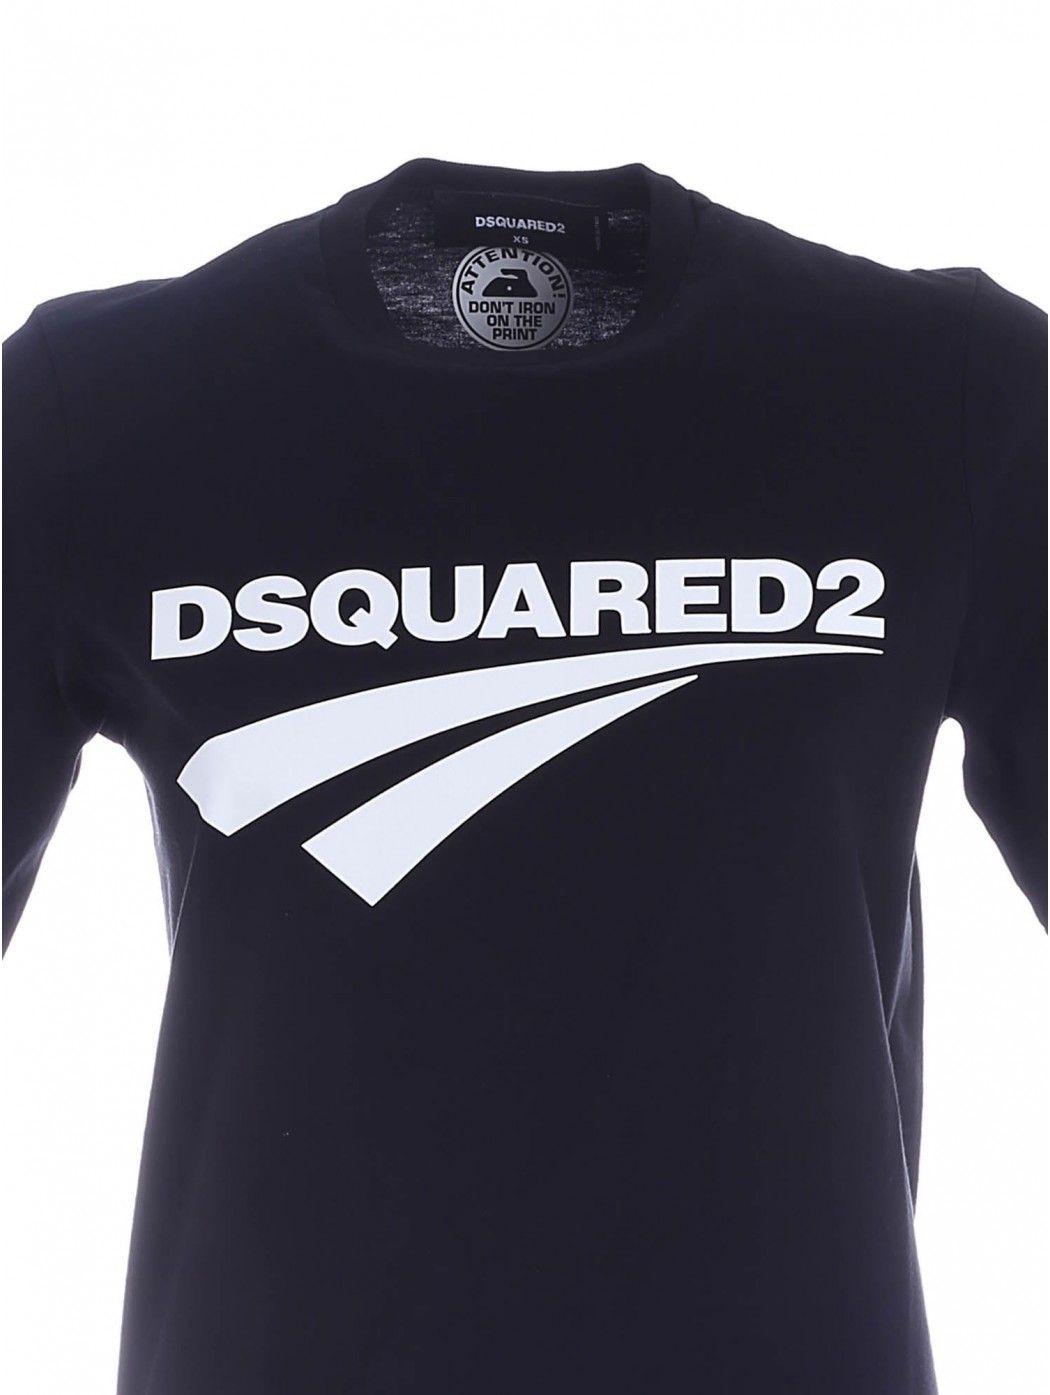 T-SHIRT DSQUARED2 S75GD0113S23009 900